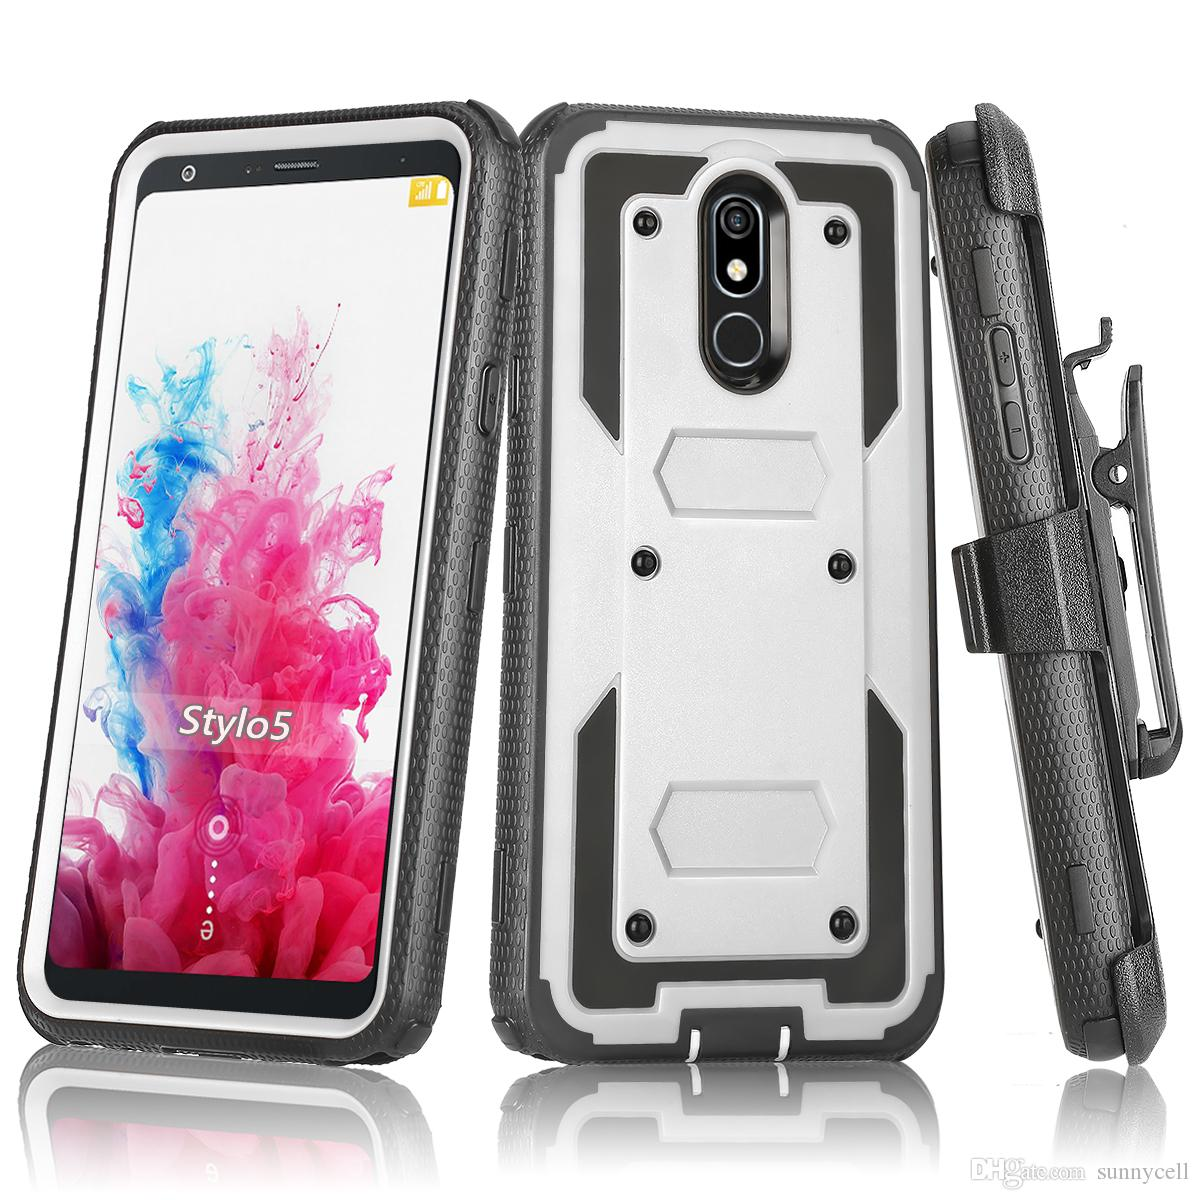 For Motorola E7 E6 Z4 G7 Play Plus Heavy Duty Shockproof Holster swivel Belt Clip Rotatable Kickstand Defender Phone Case Cover